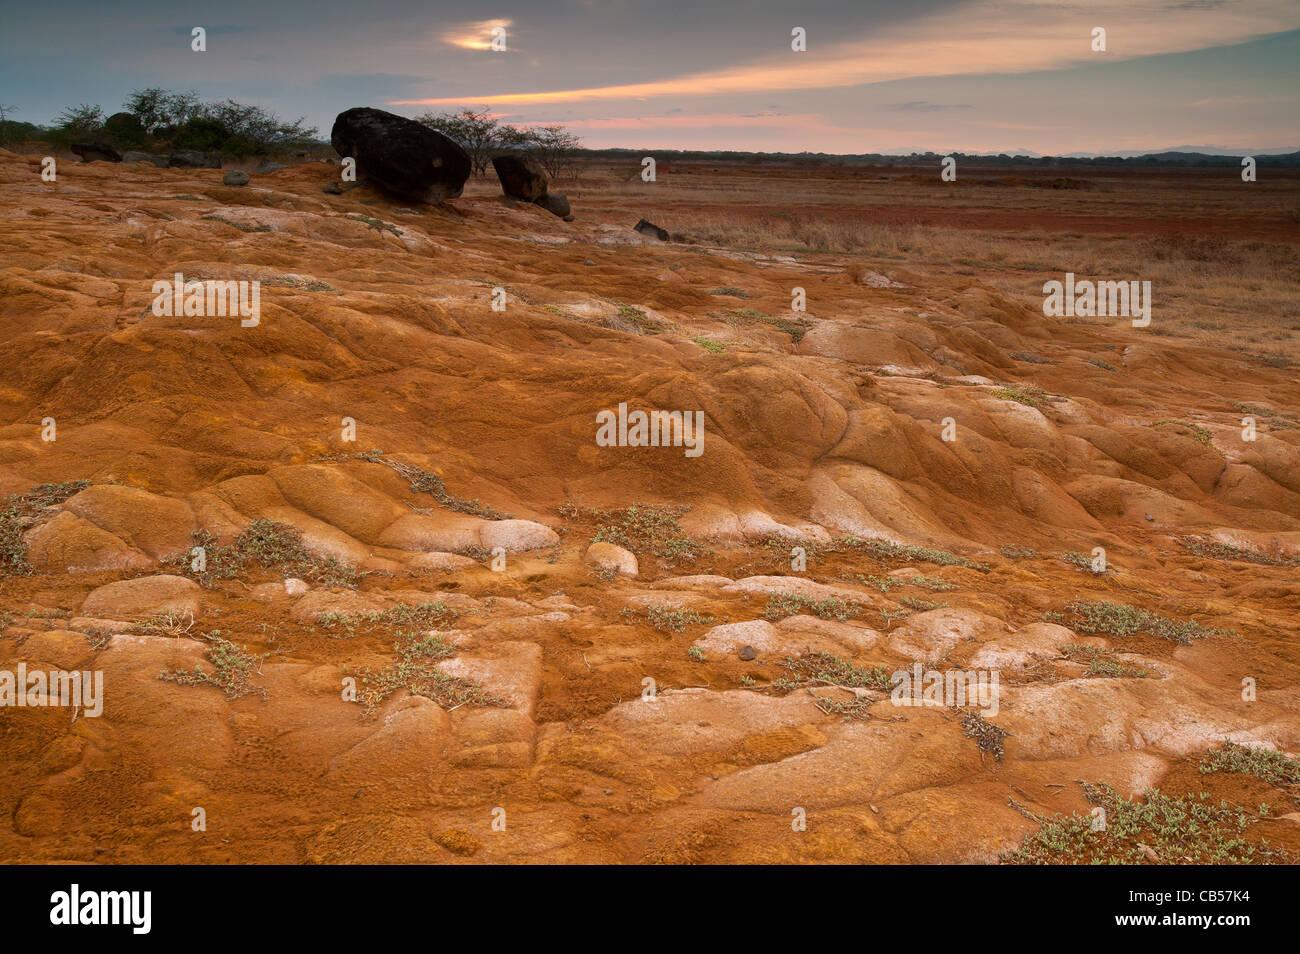 Desert landscape in Sarigua national park, Herrera province, Republic of Panama. Stock Foto